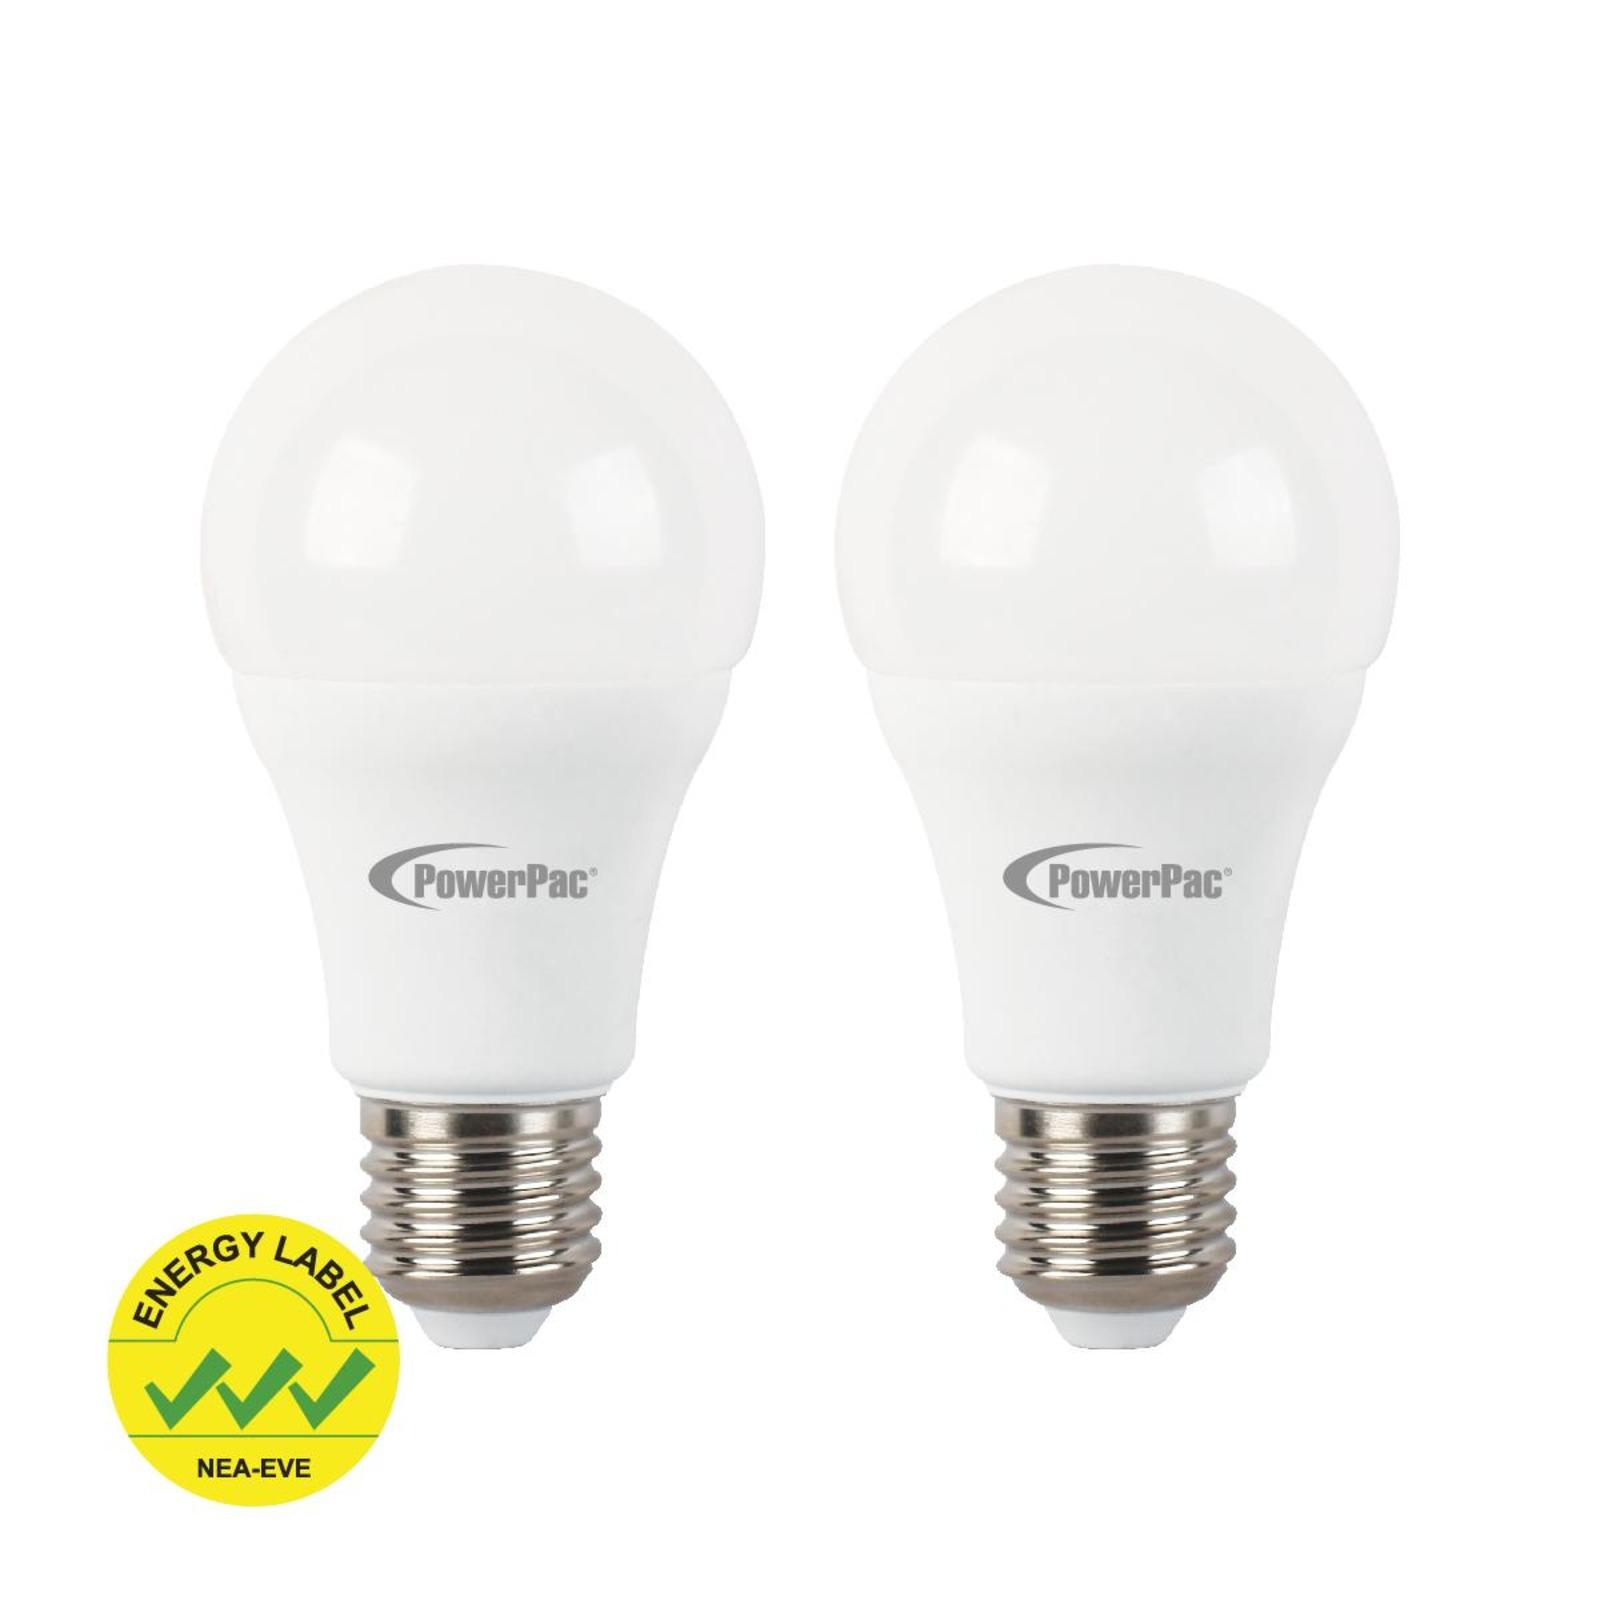 PowerPac 2 Pieces x 5.5W E27 Vertex LED Bulb Daylight PP6551